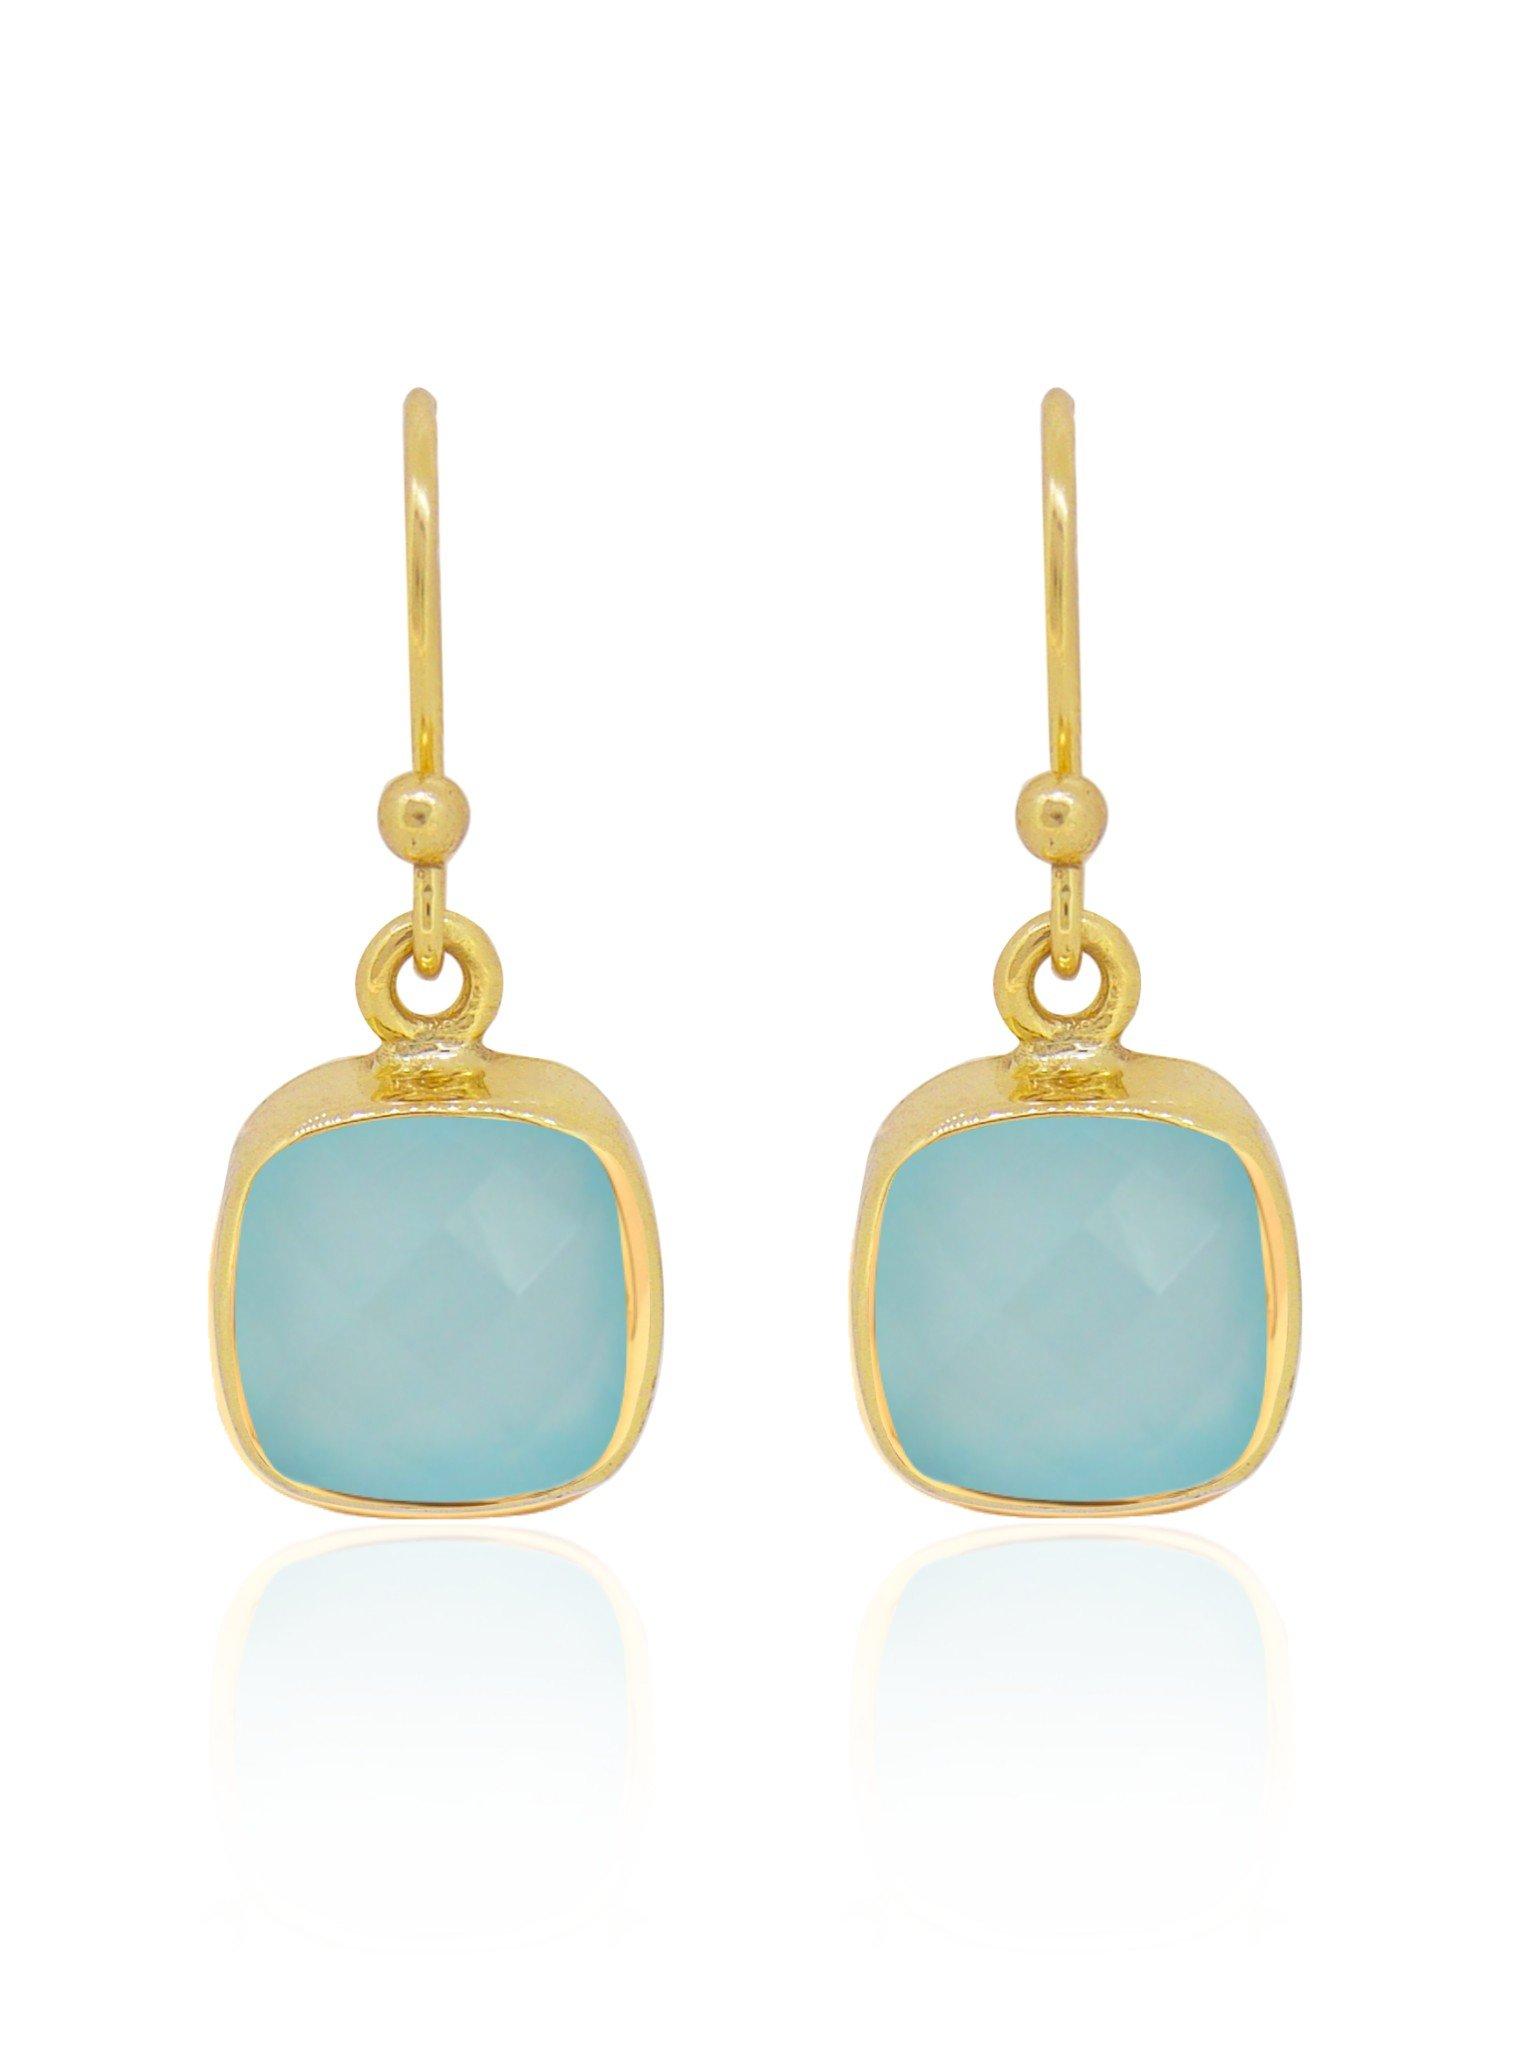 Indie Aqua Chalcedony Gemstone Earrings in Gold